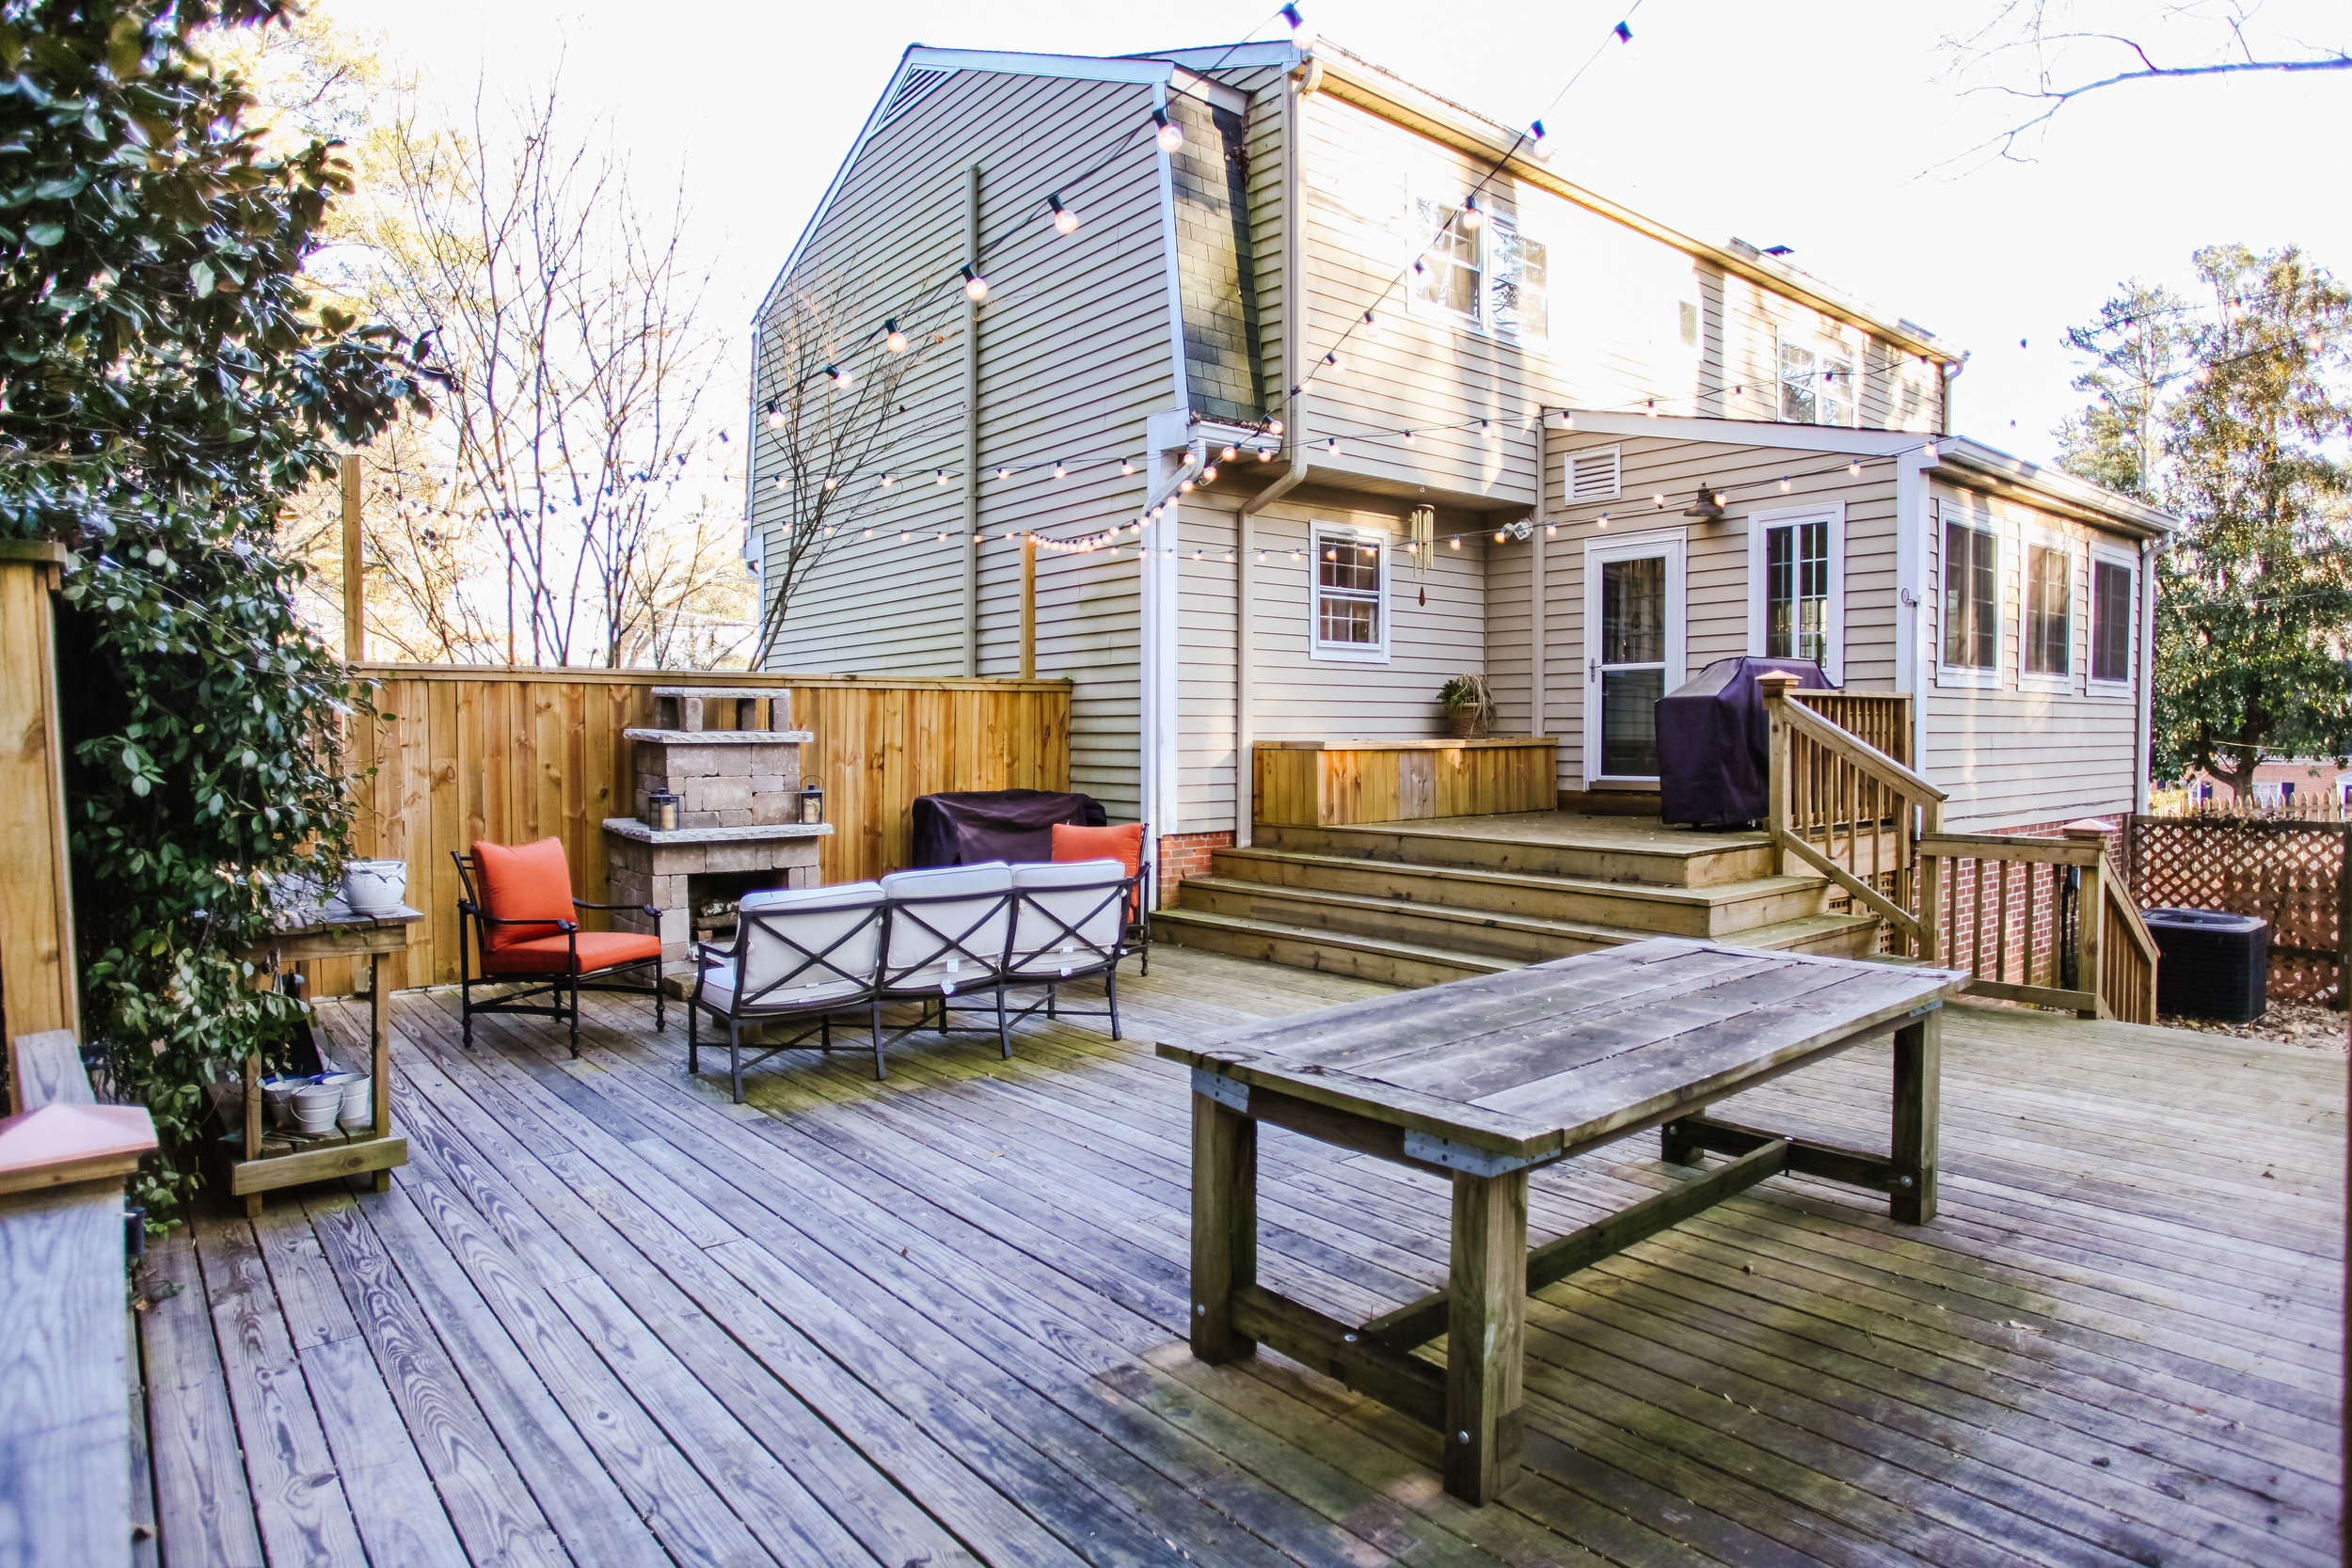 wingard-real-estate-sandy-springs-dream-home-backyard-goals-atlanta-buckhead-80.jpg